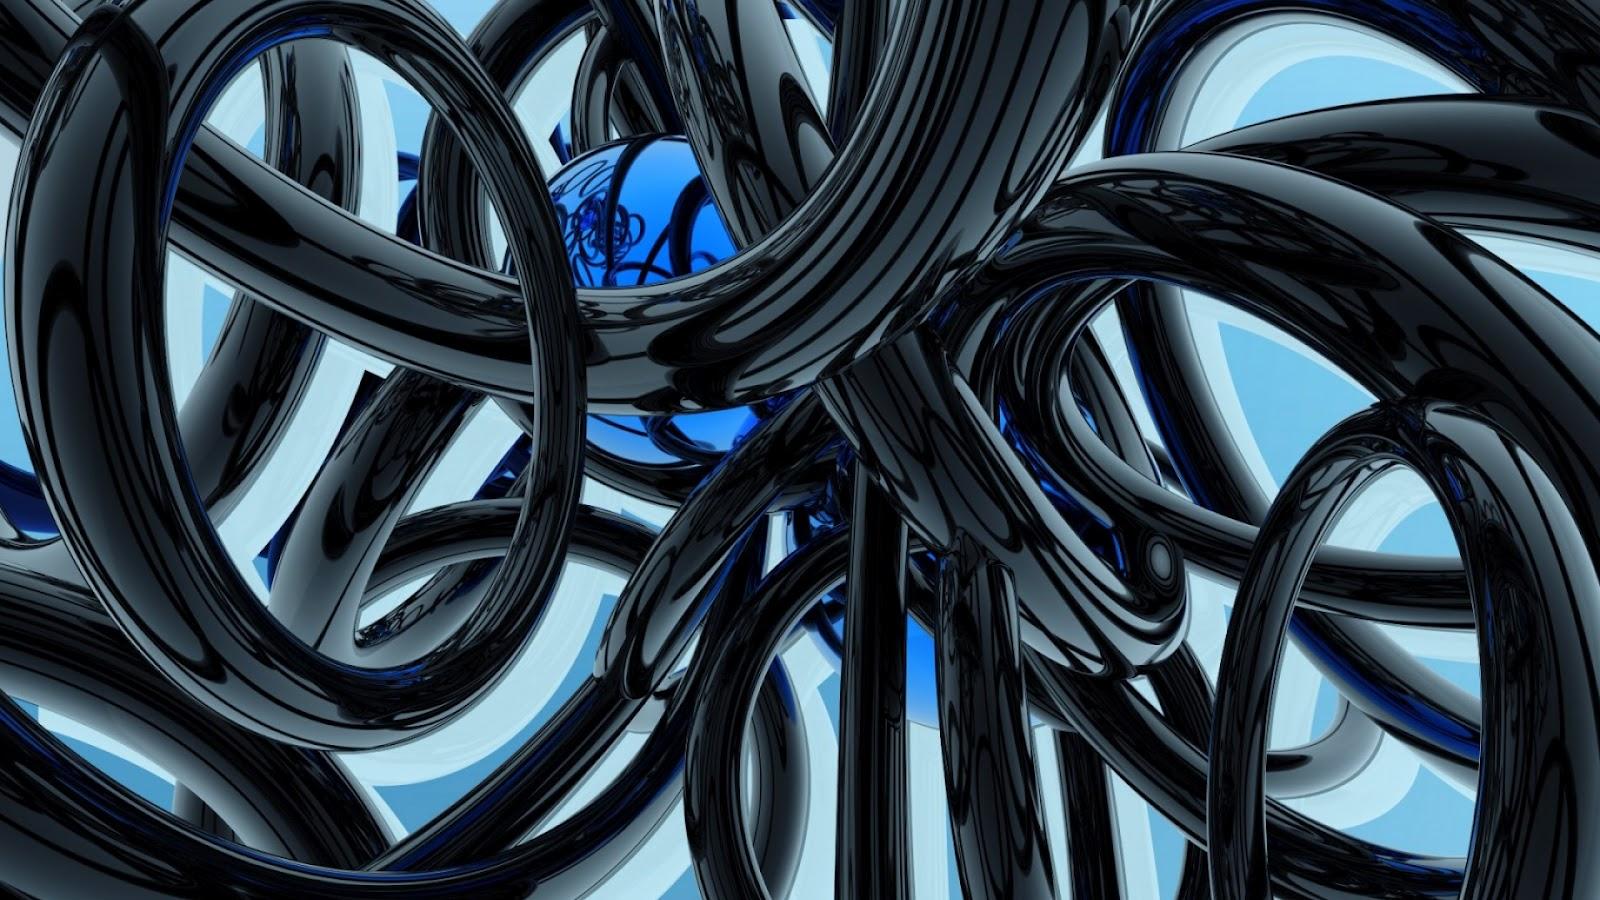 http://3.bp.blogspot.com/-iyqRGgDdn58/TzLRjJ4uBQI/AAAAAAAAAyM/dVsIGlEflzA/s1600/Abstract-Spiral-Wallpaper.jpg